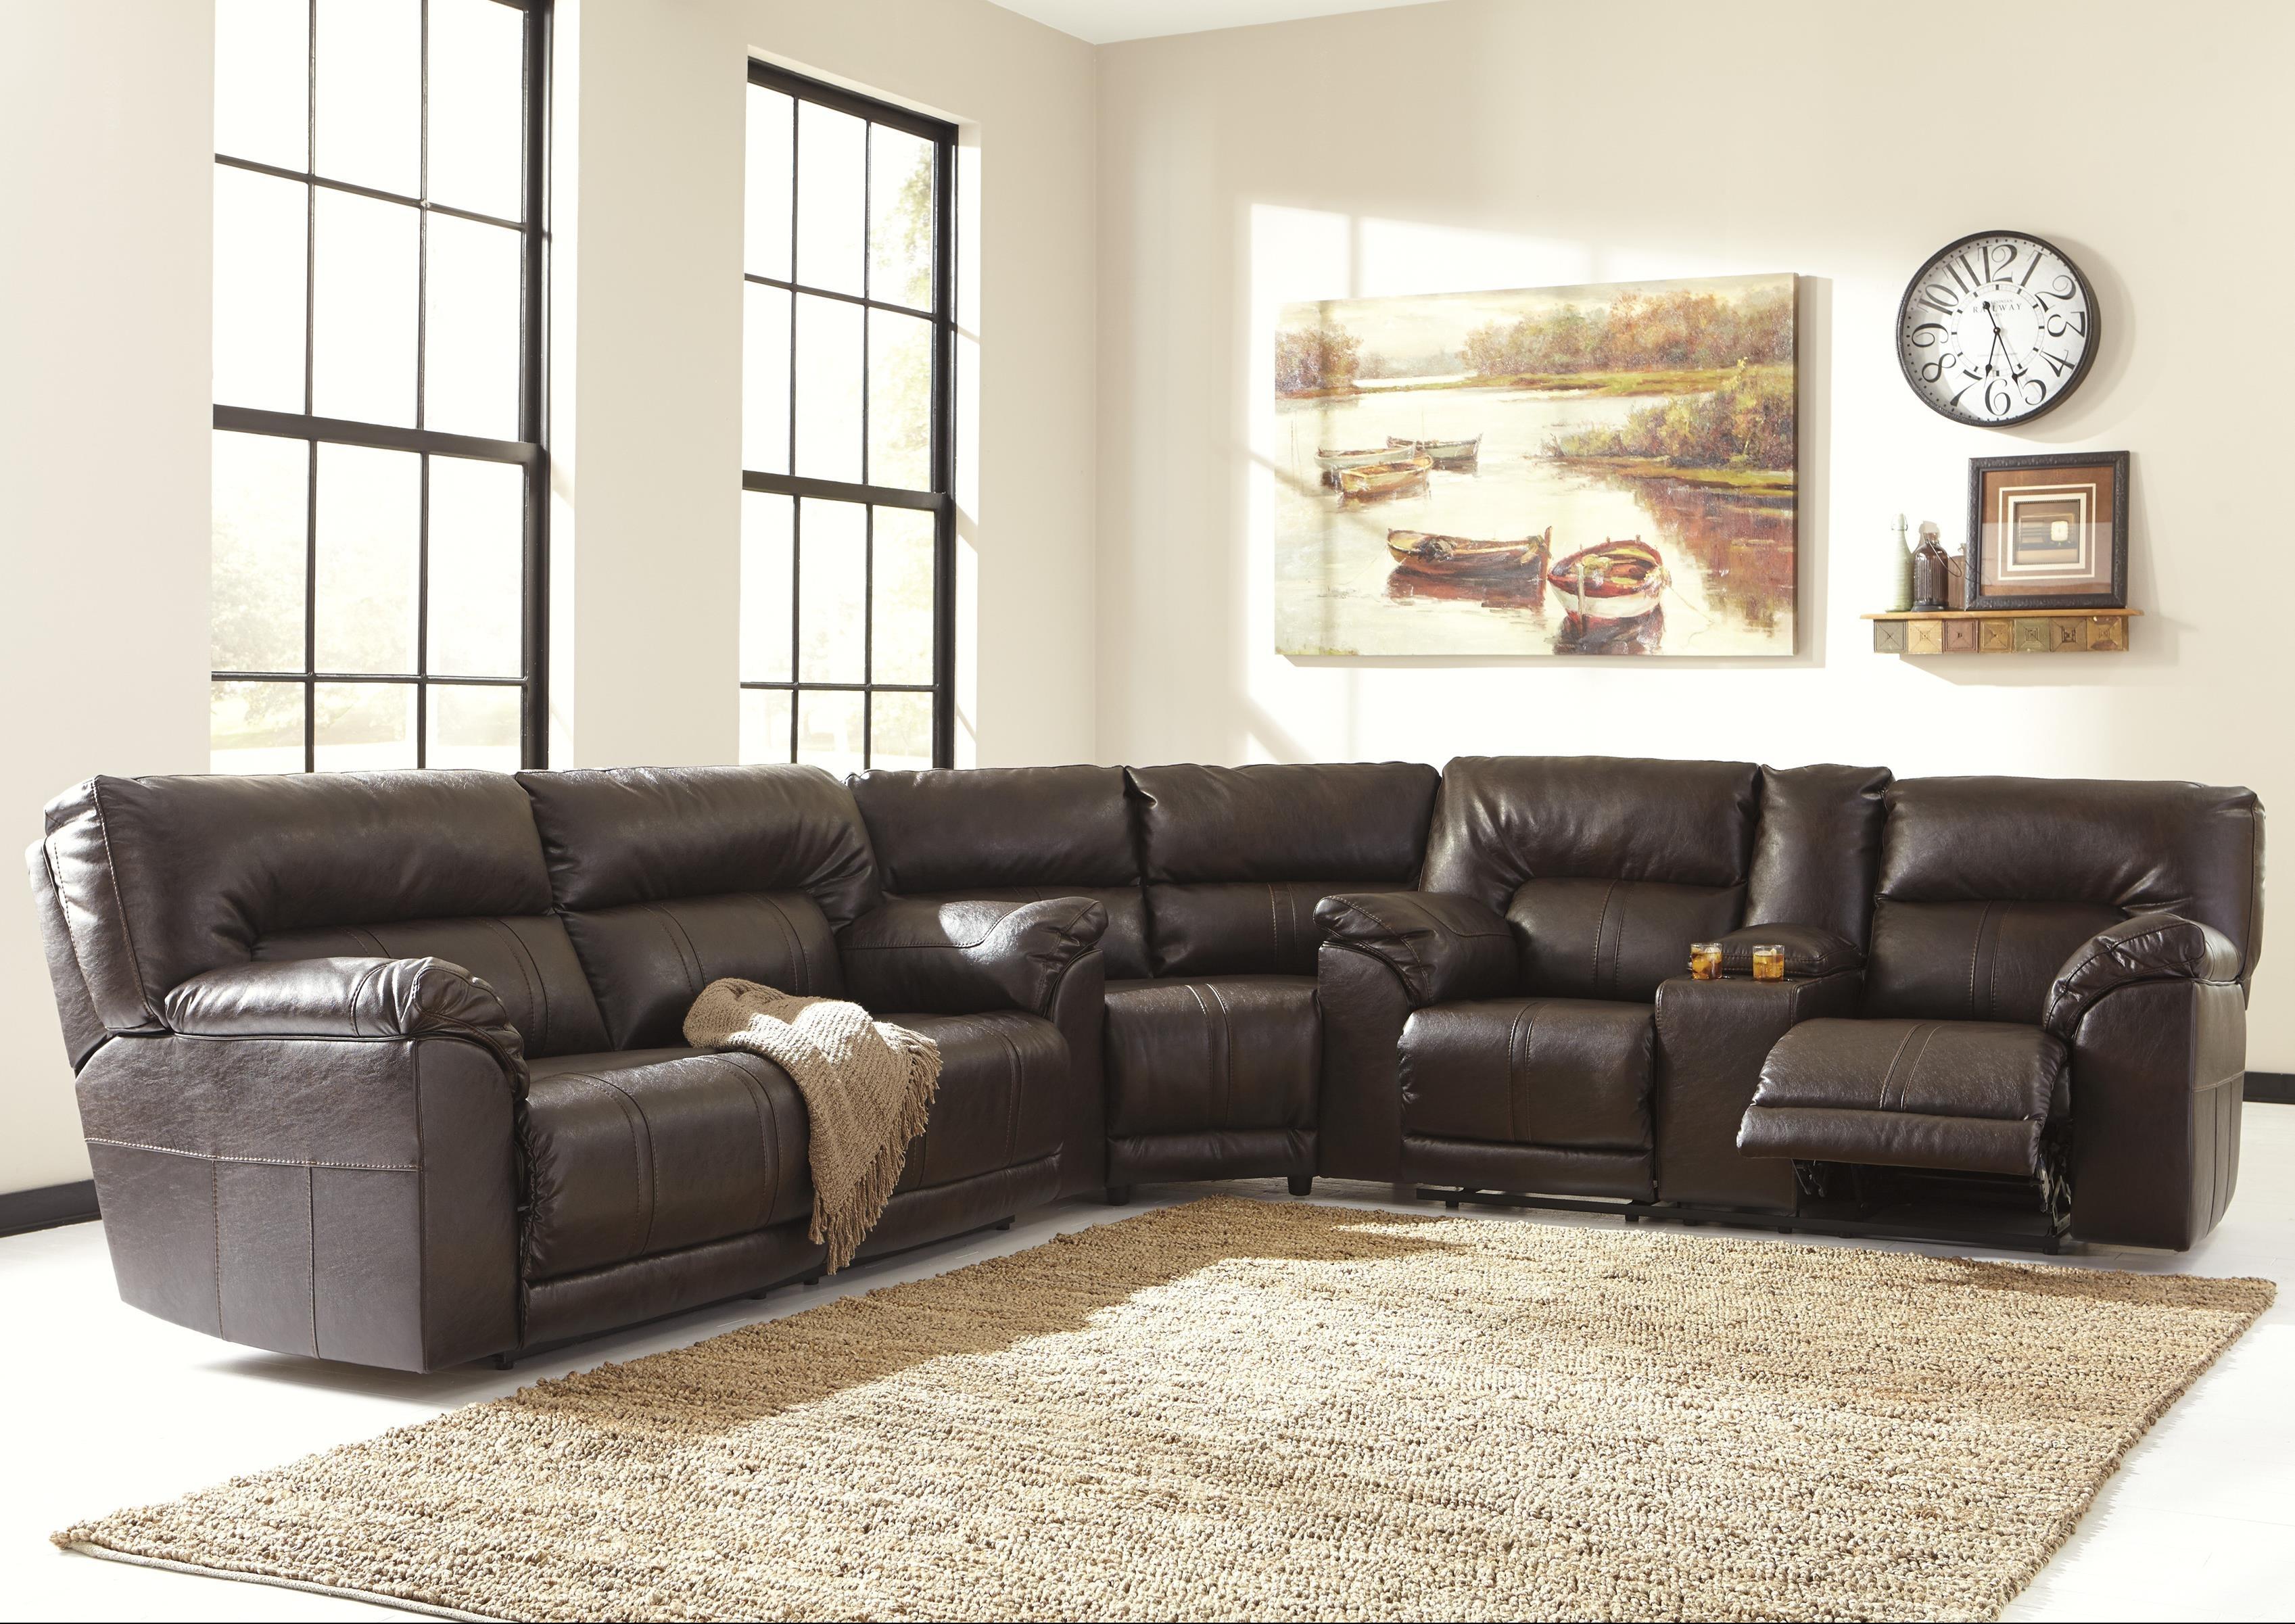 Benchcraftashley Barrettsville Durablend® 3 Piece Reclining Inside  Sectional Sofas At Birmingham Al (Image 1